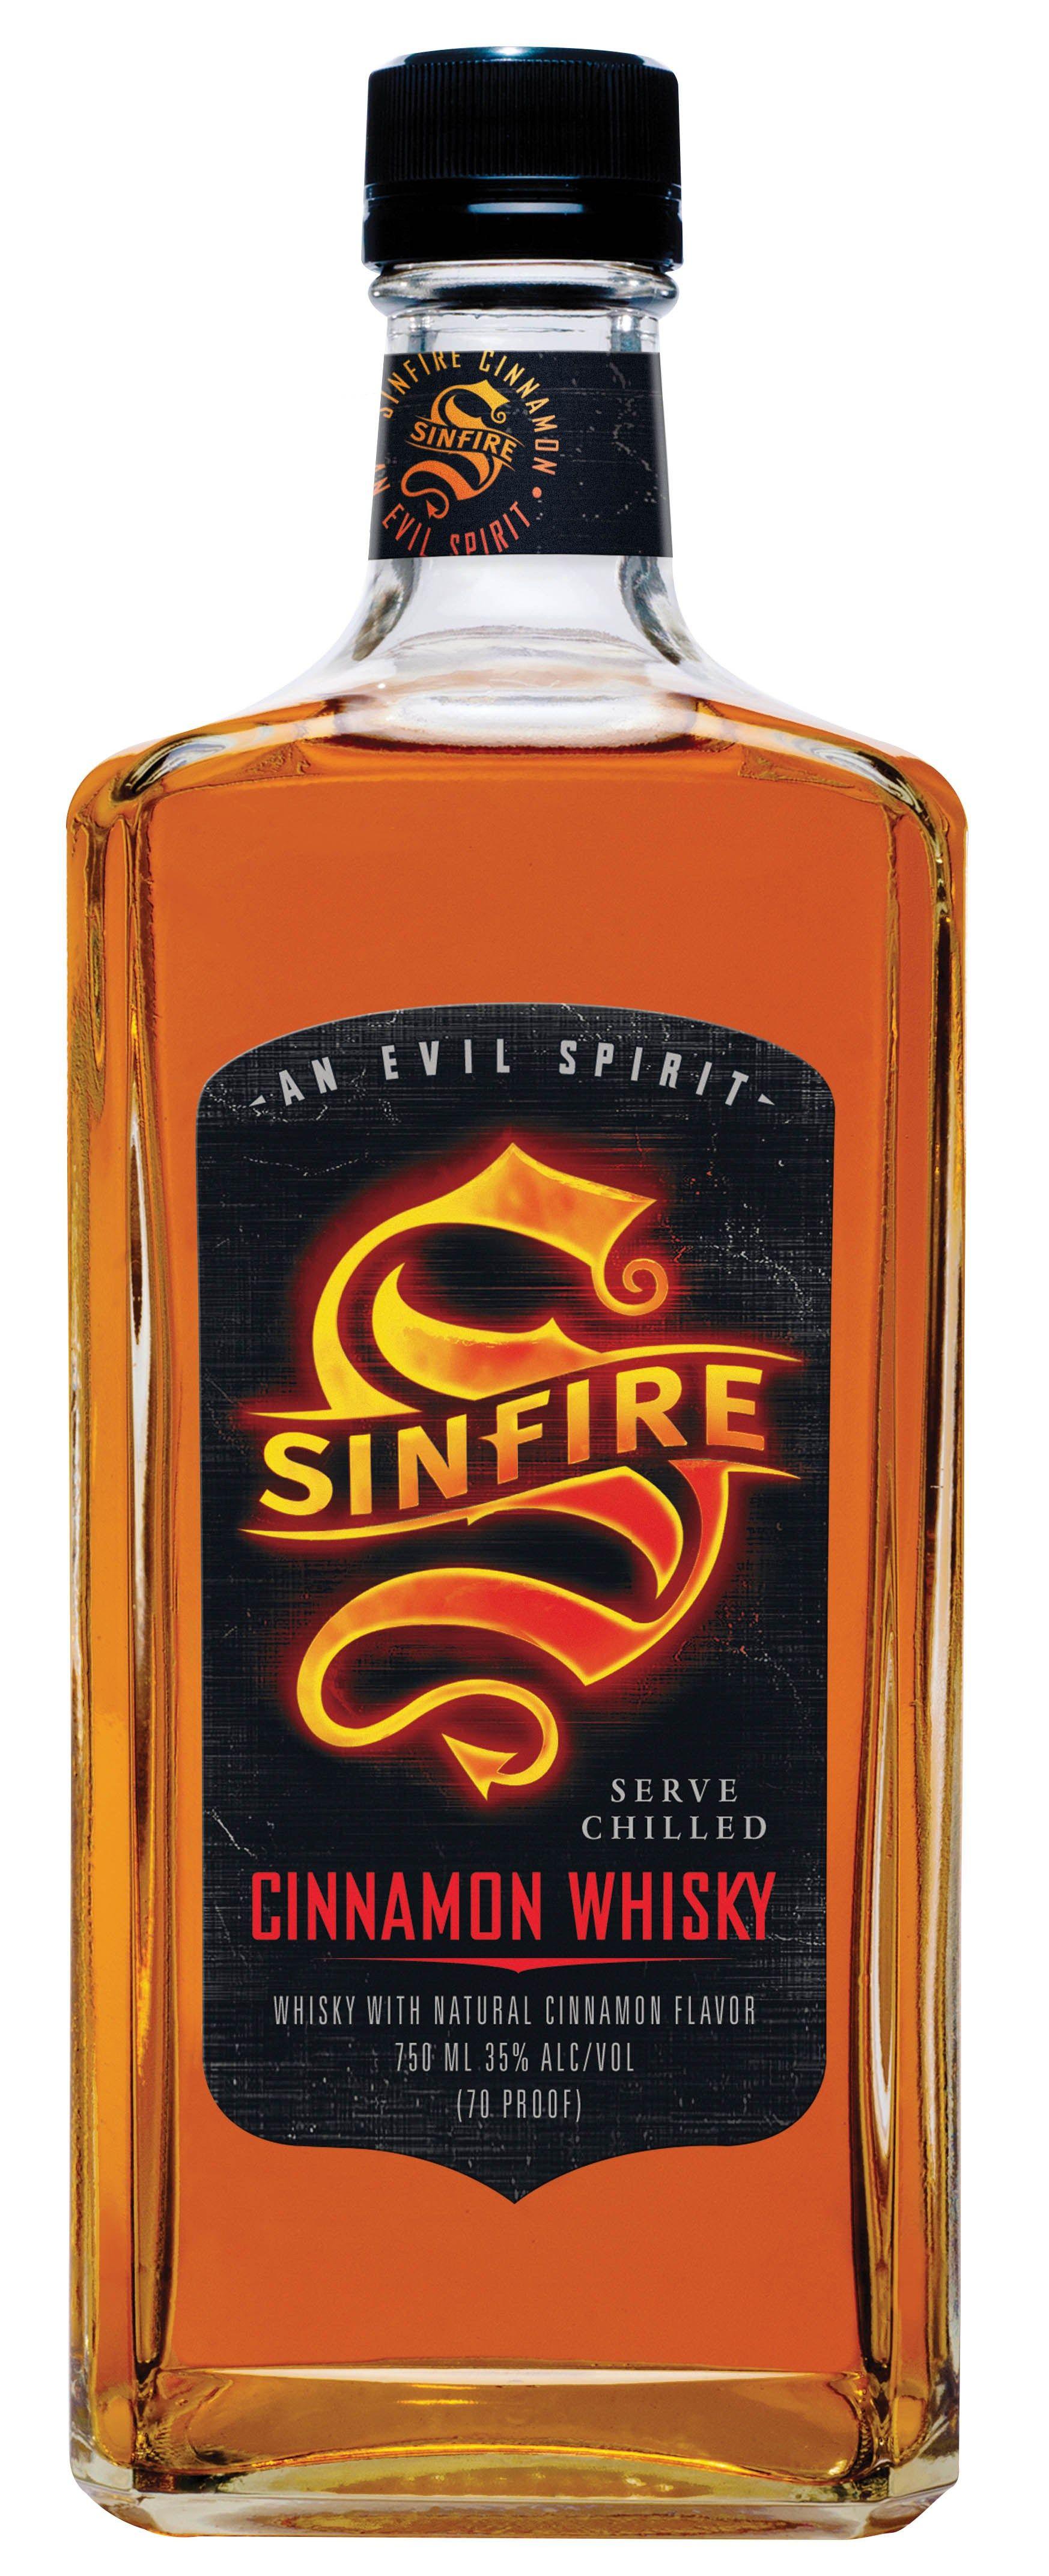 Sinfire Cinnamon Whisky Good